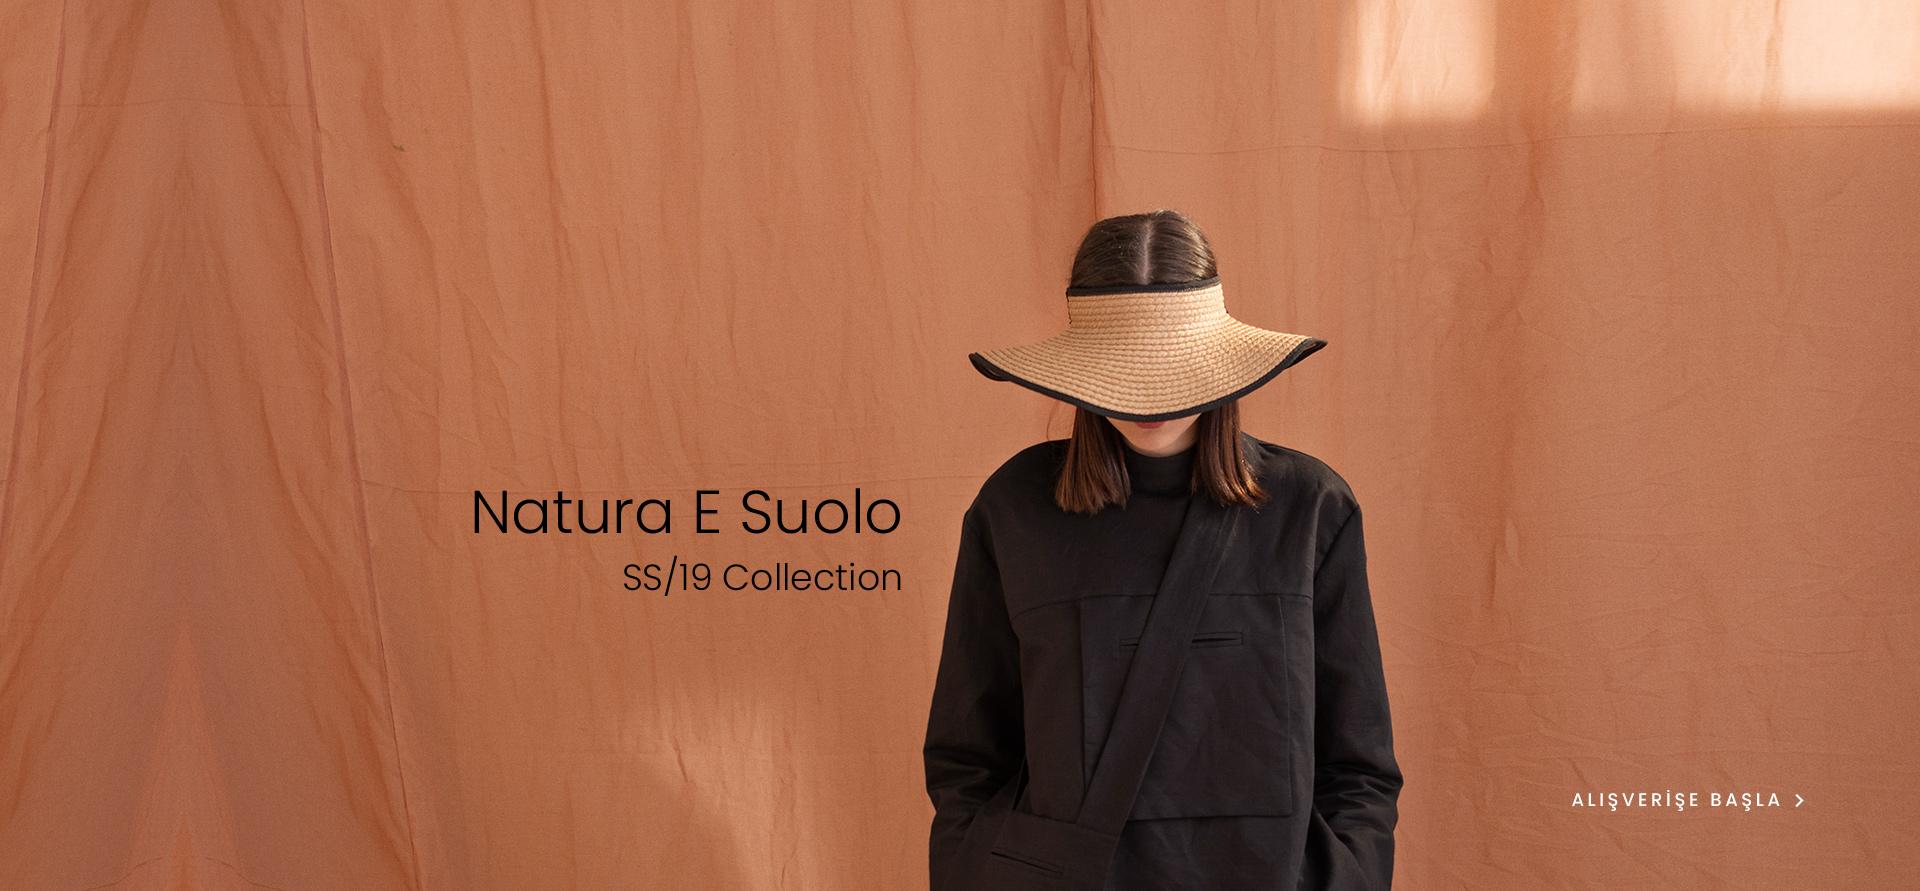 Natura E Suolo SS/19 Collection